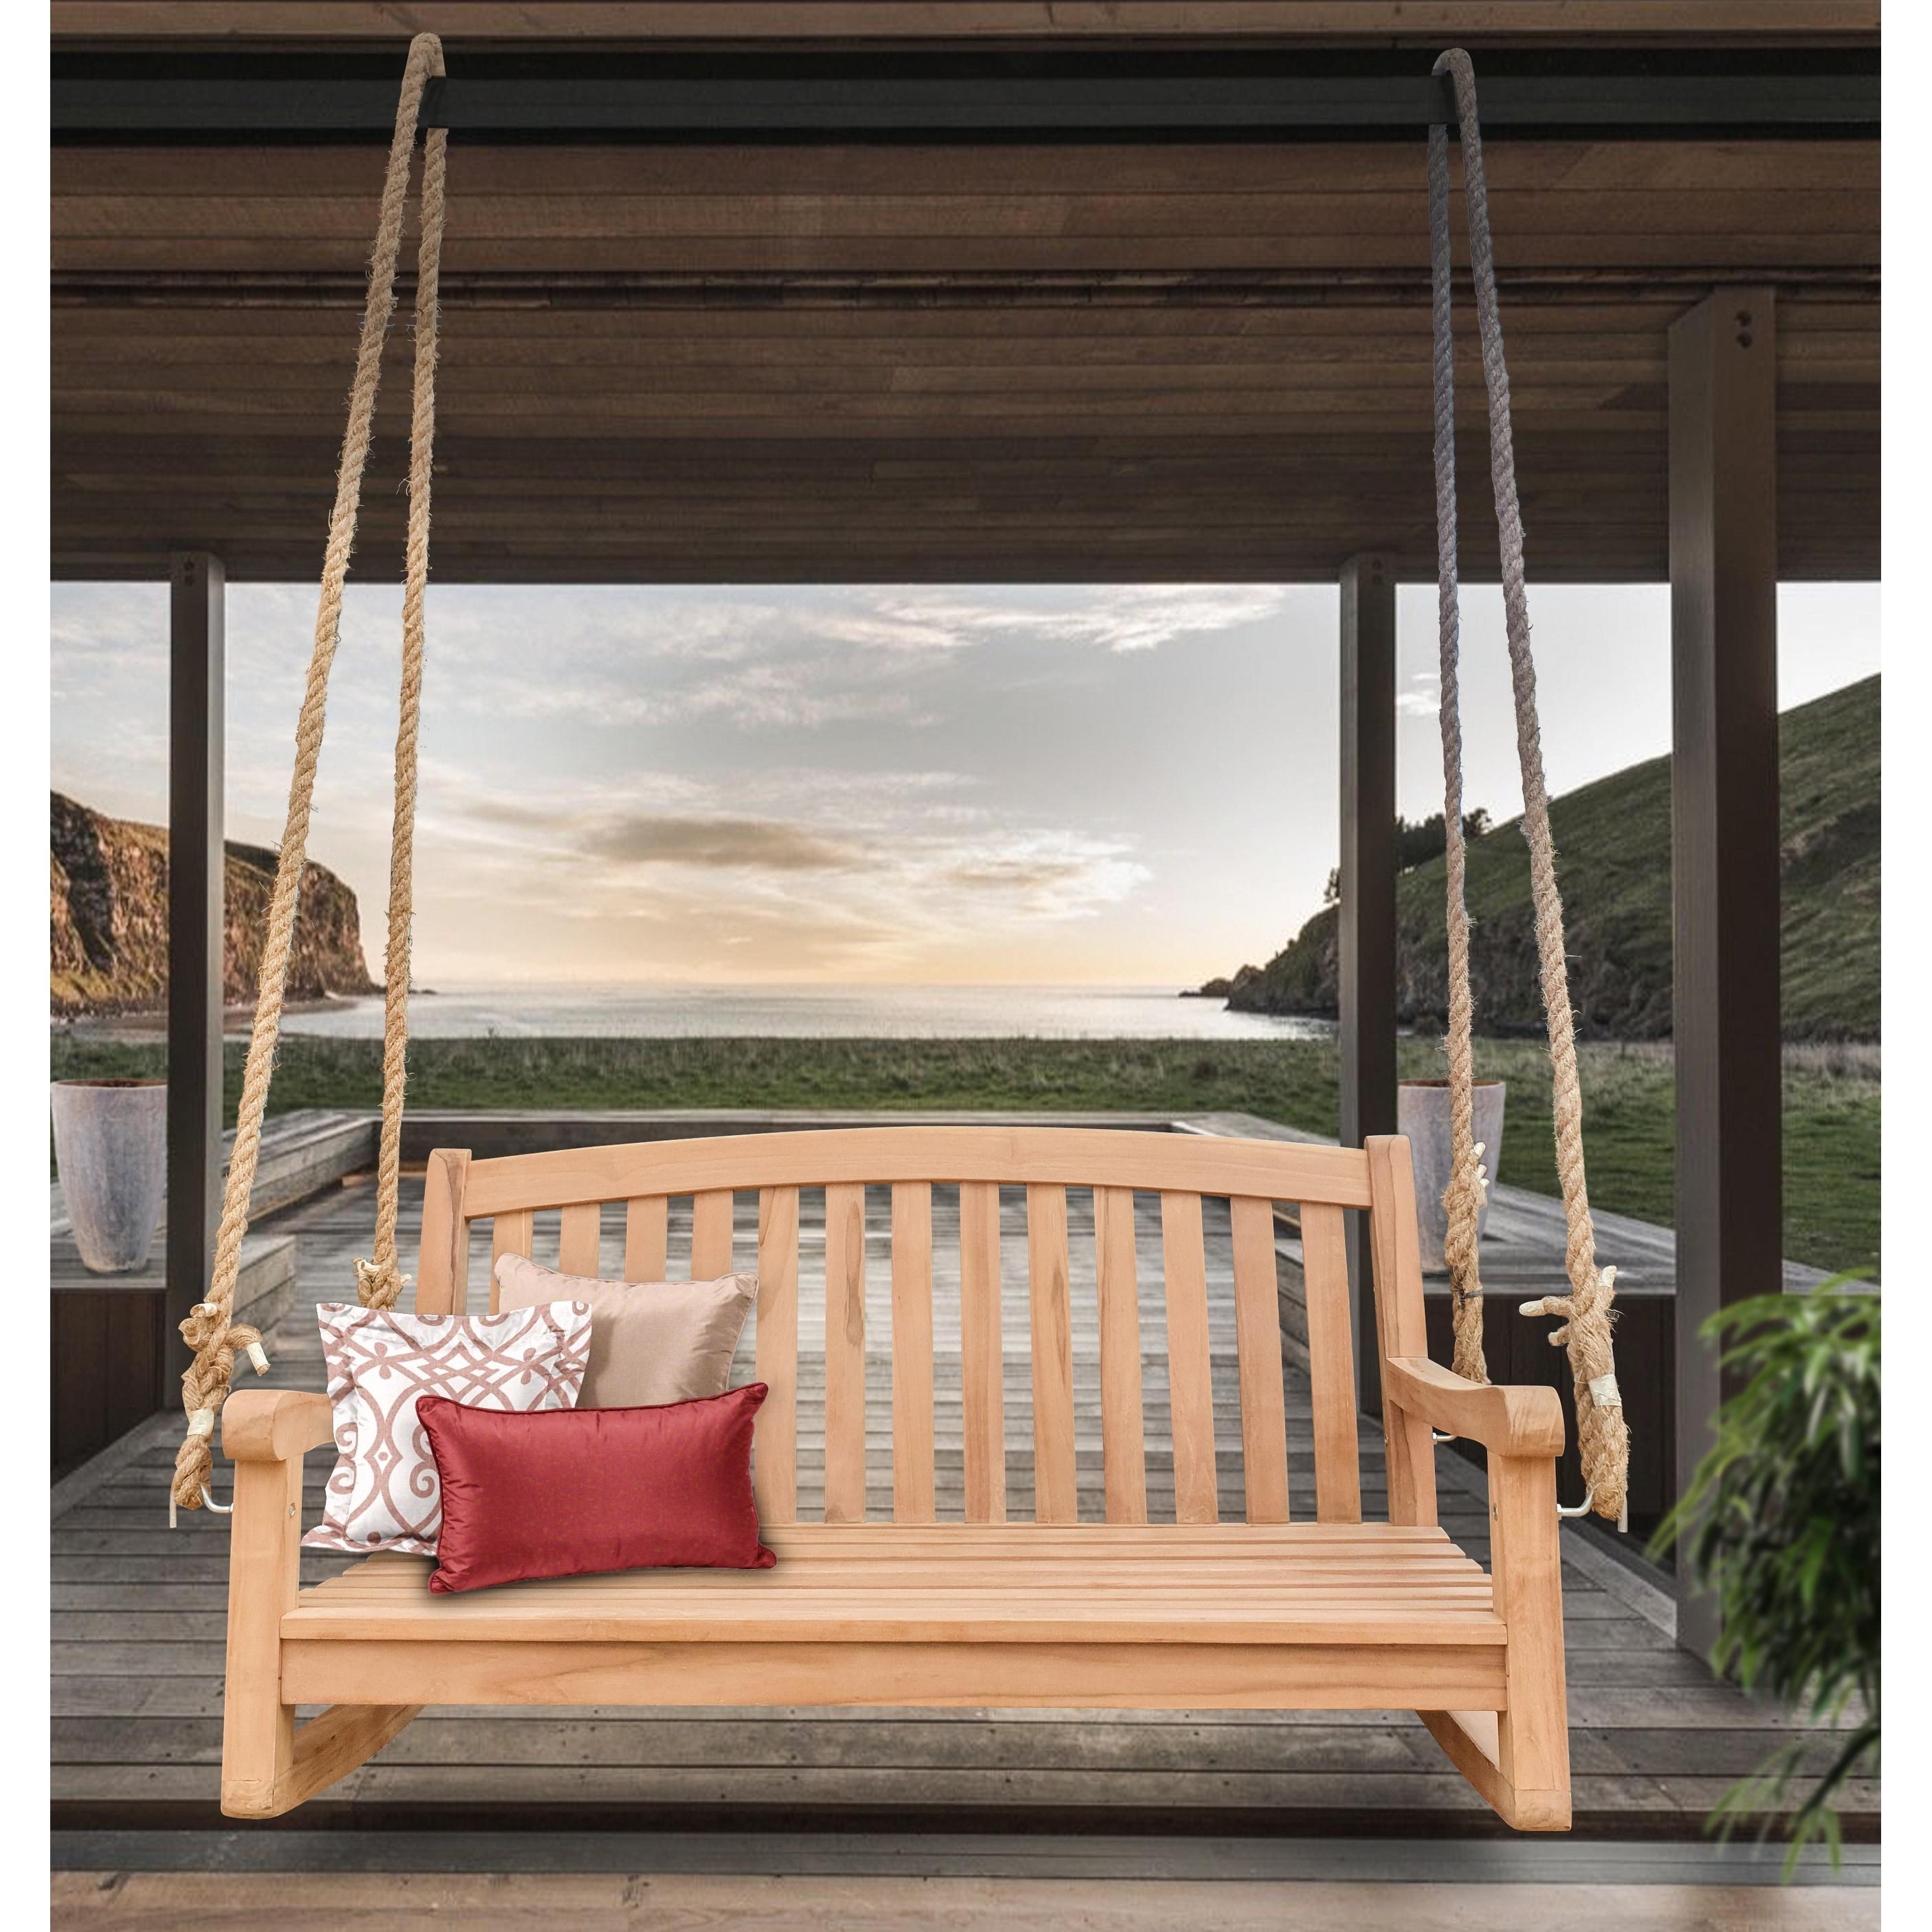 Shop Black Friday Deals On Seven Seas Teak San Jose Teak Wood Double Outdoor Porch Swing 4 Foot Overstock 31525388